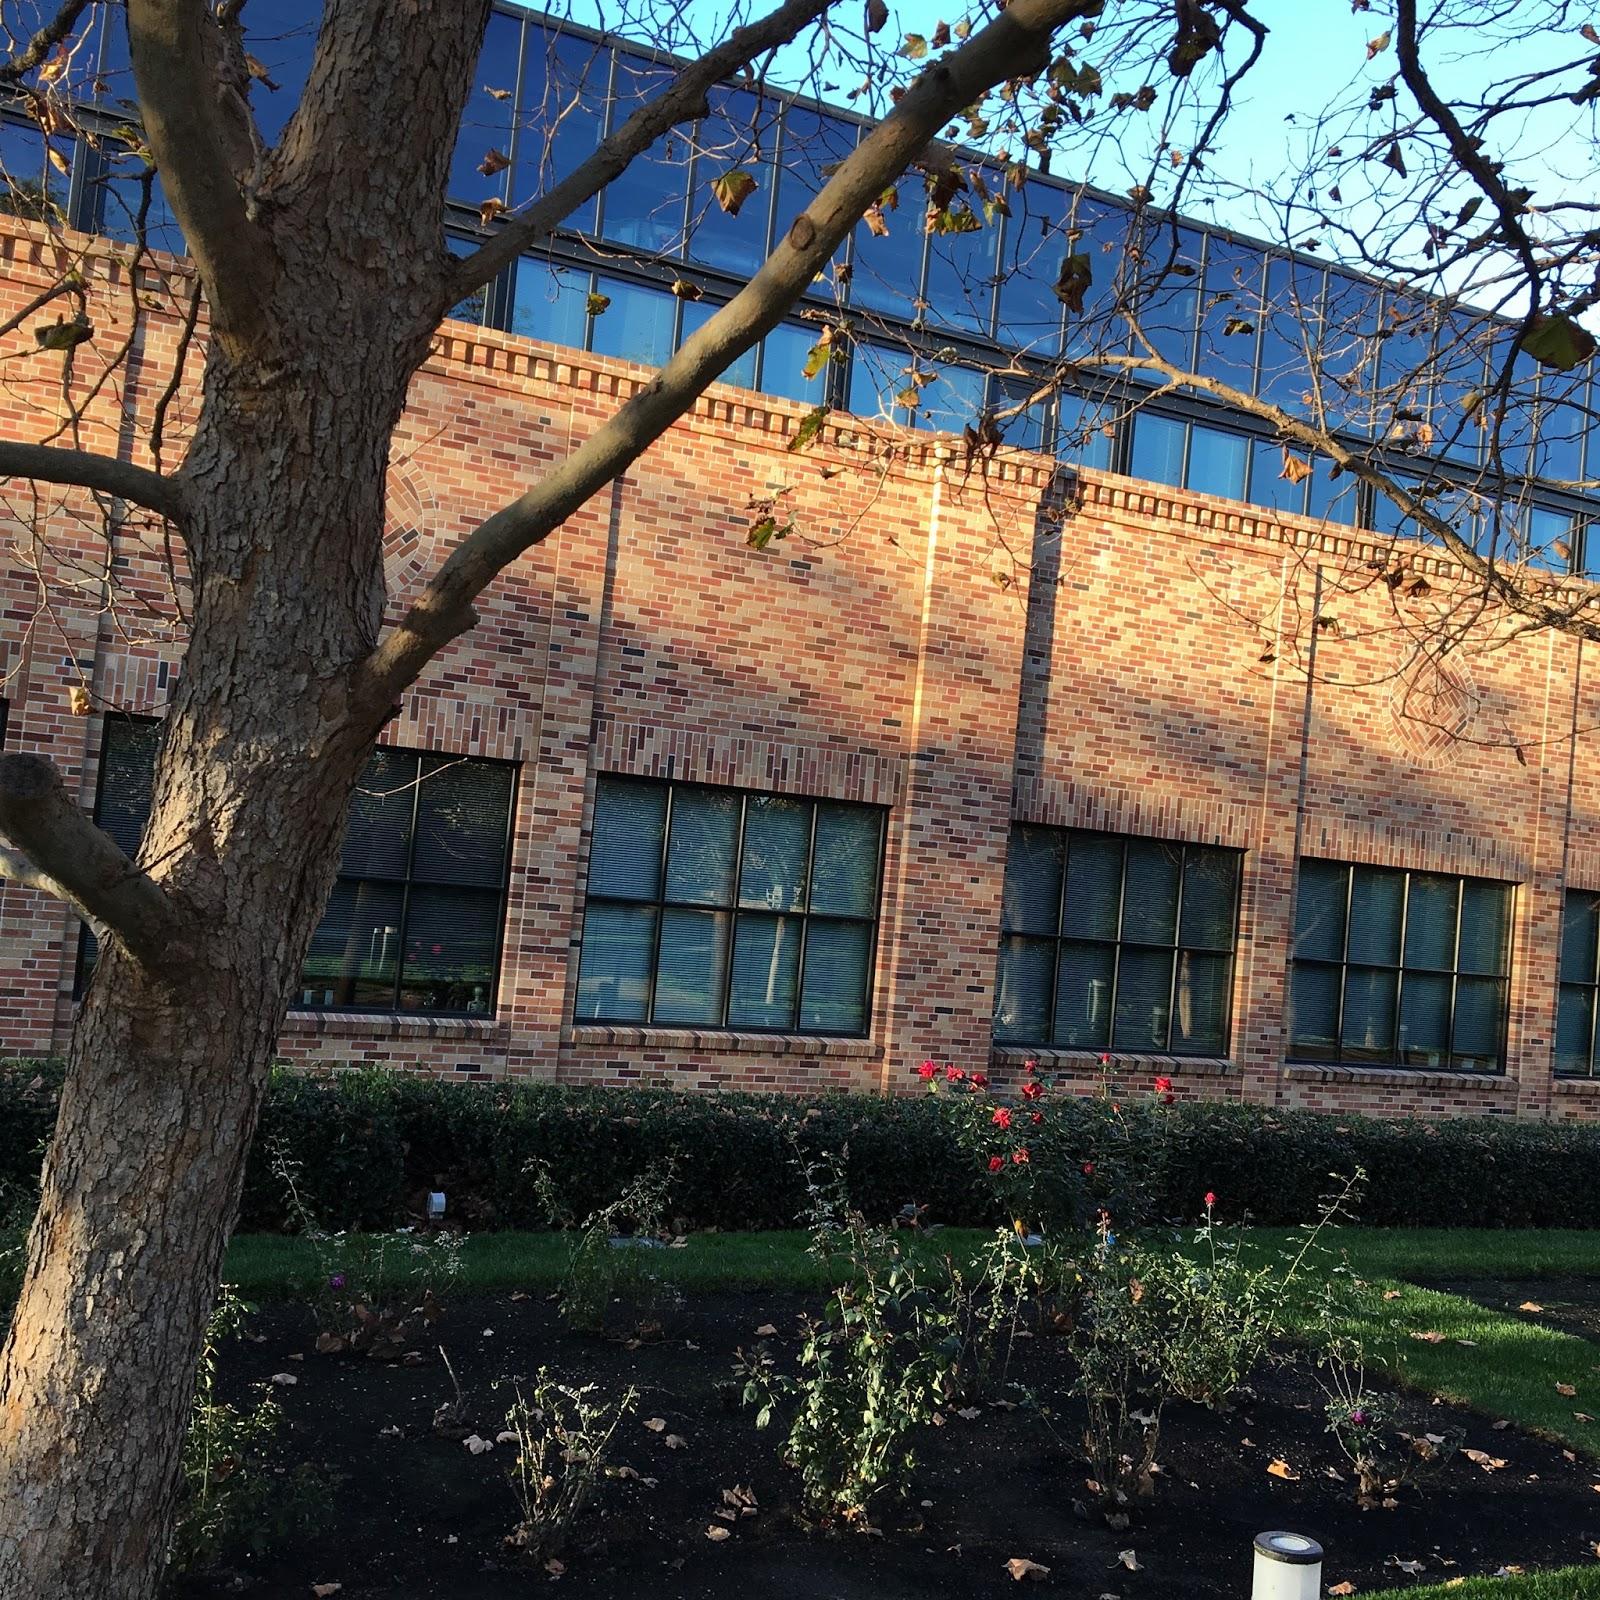 pixar studios steve jobs building 2017